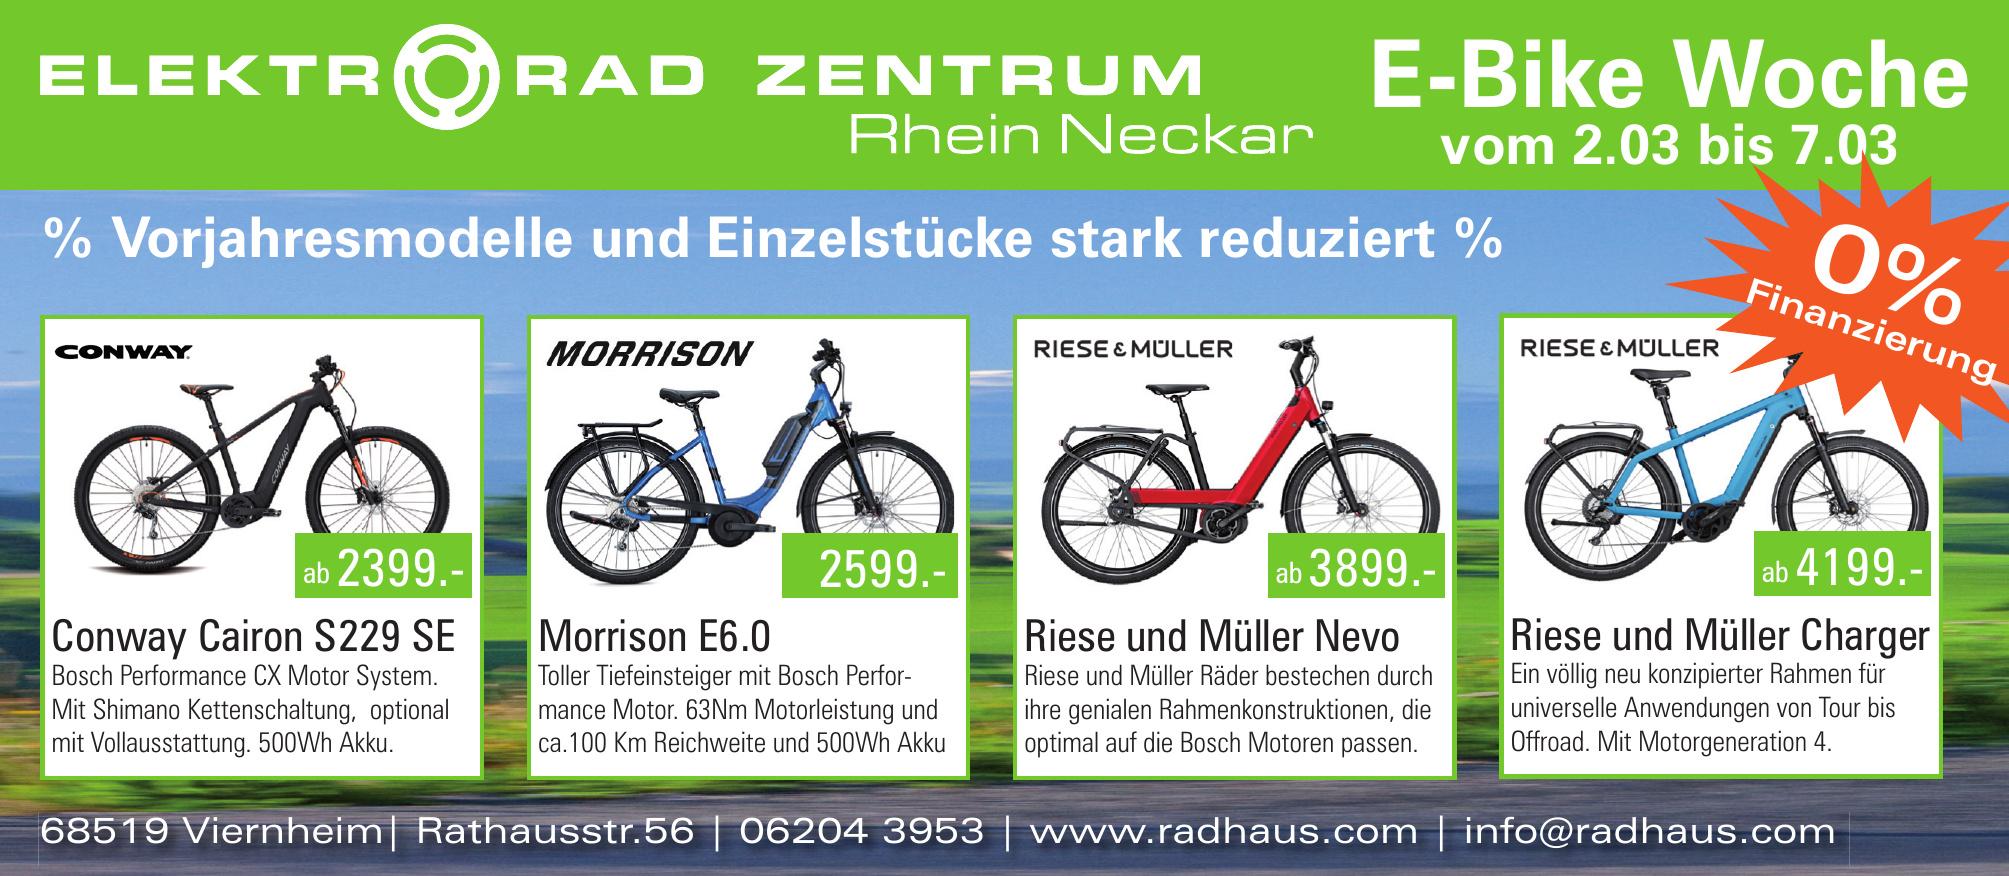 Elektrorad Zentrum Rhein-Nectar